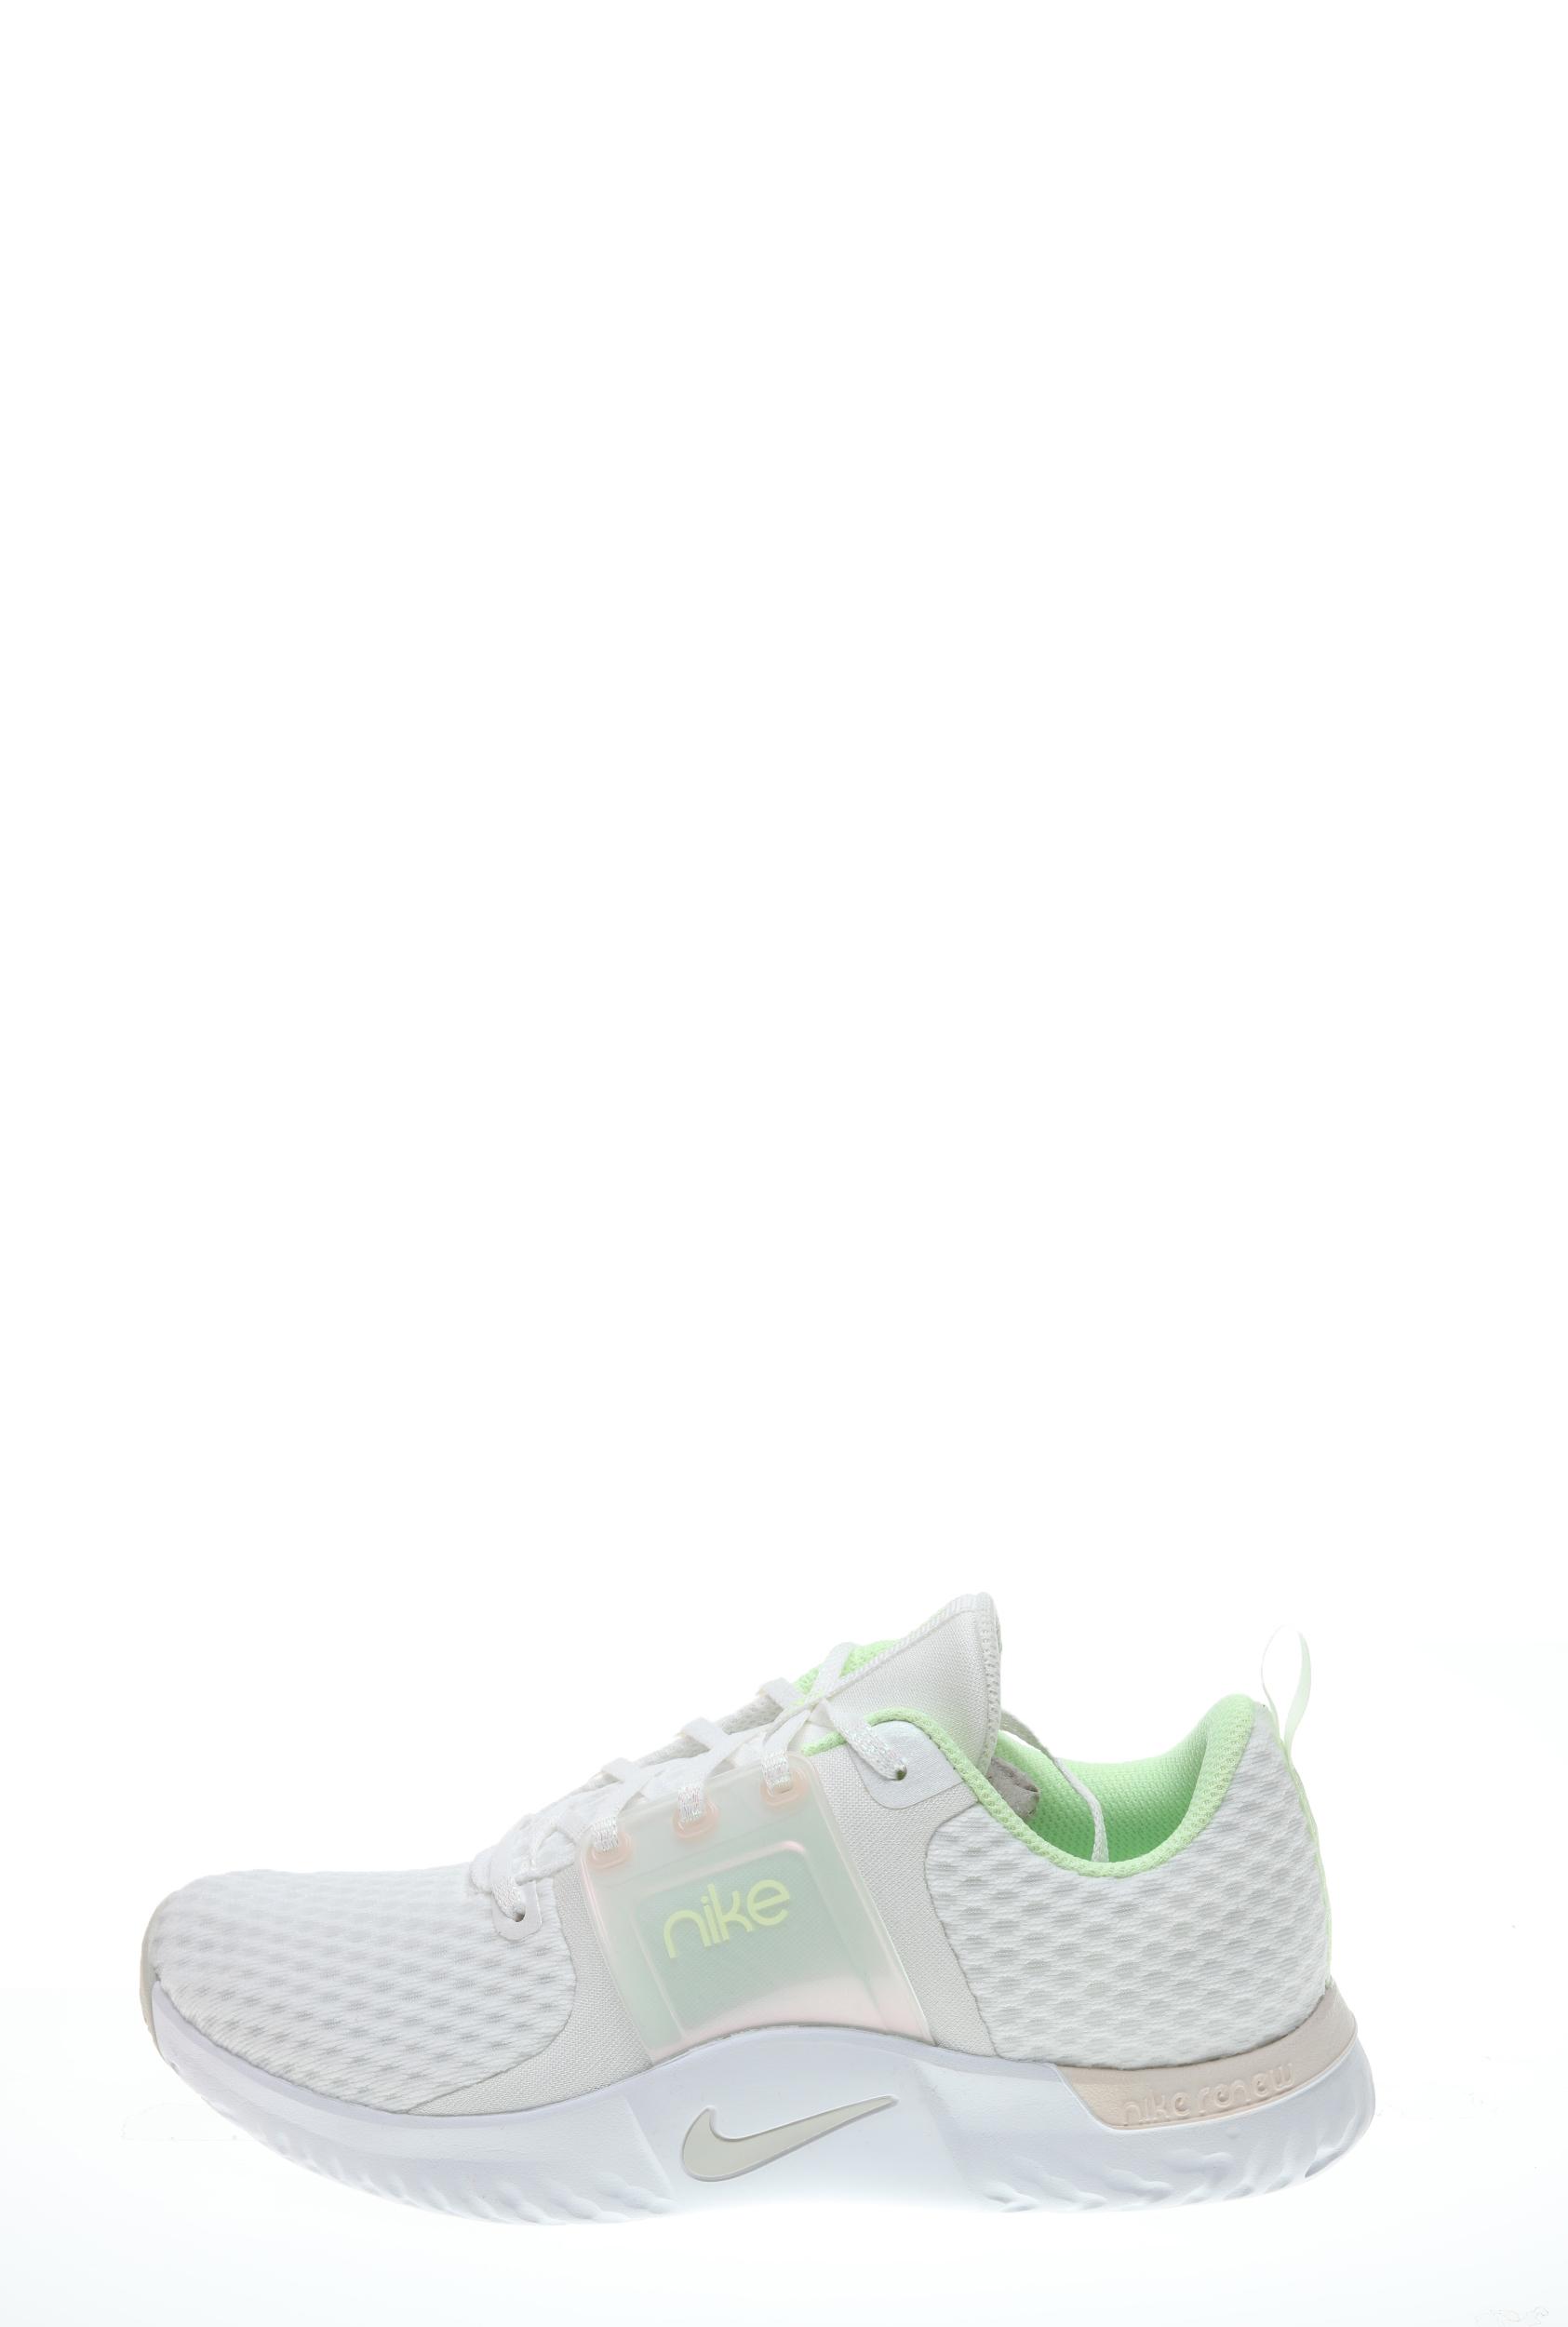 NIKE – Γυναικείο παπούτσι προπόνησης NIKE RENEW IN-SEASON TR 10